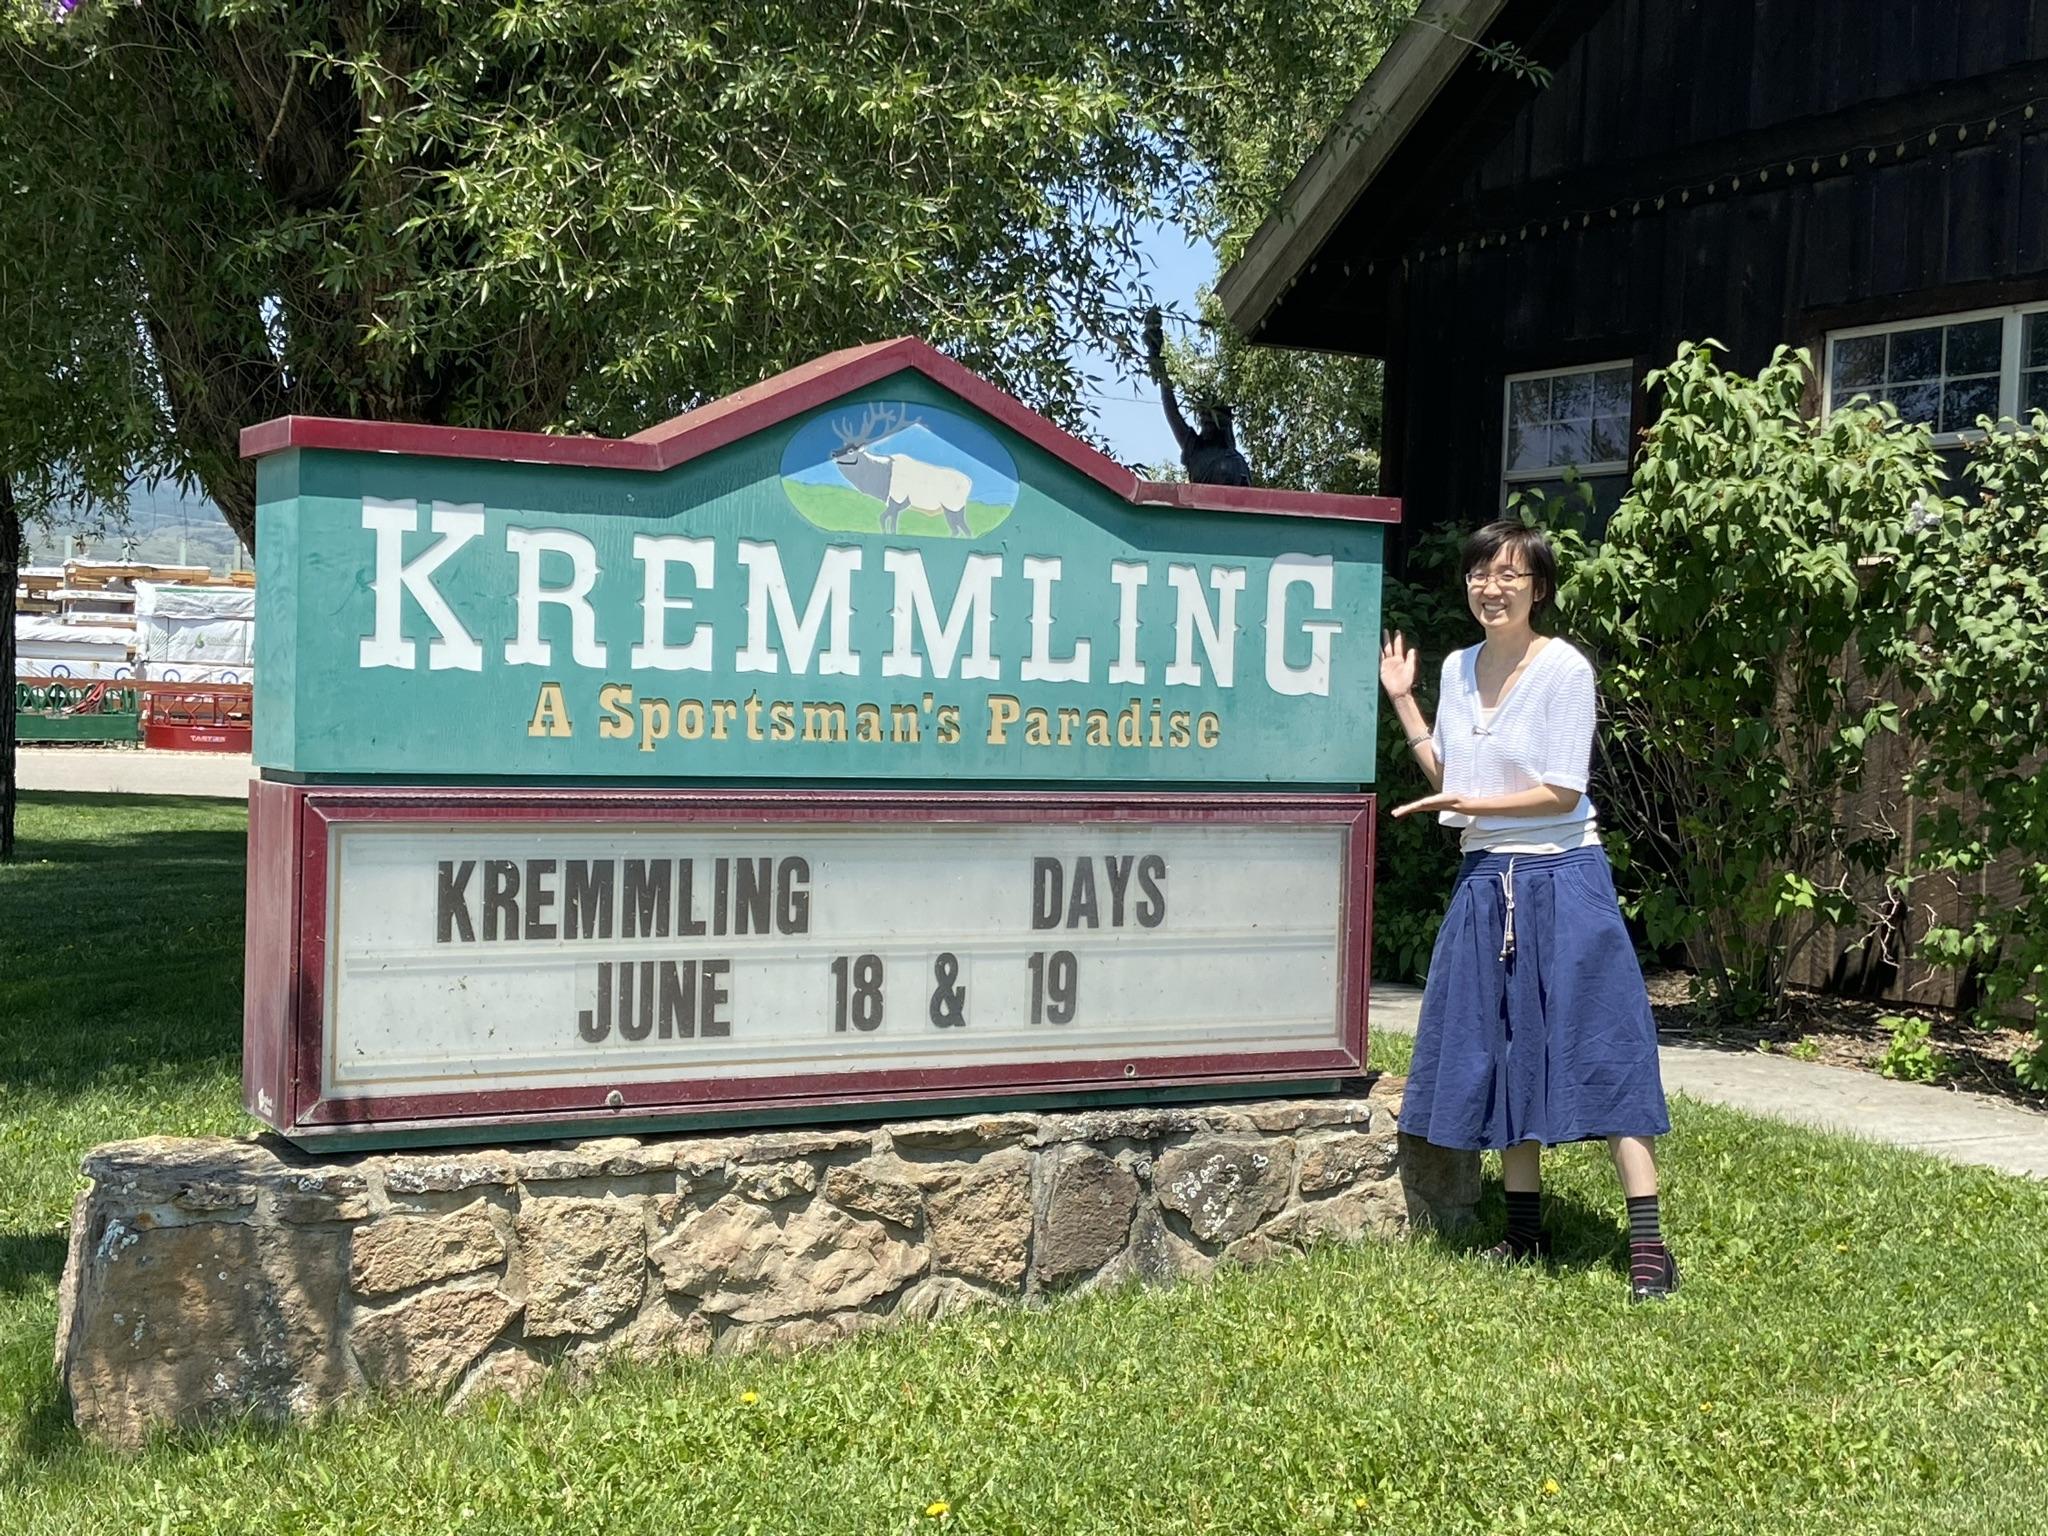 Kremmling Colorado sign and Samantha standing beside it